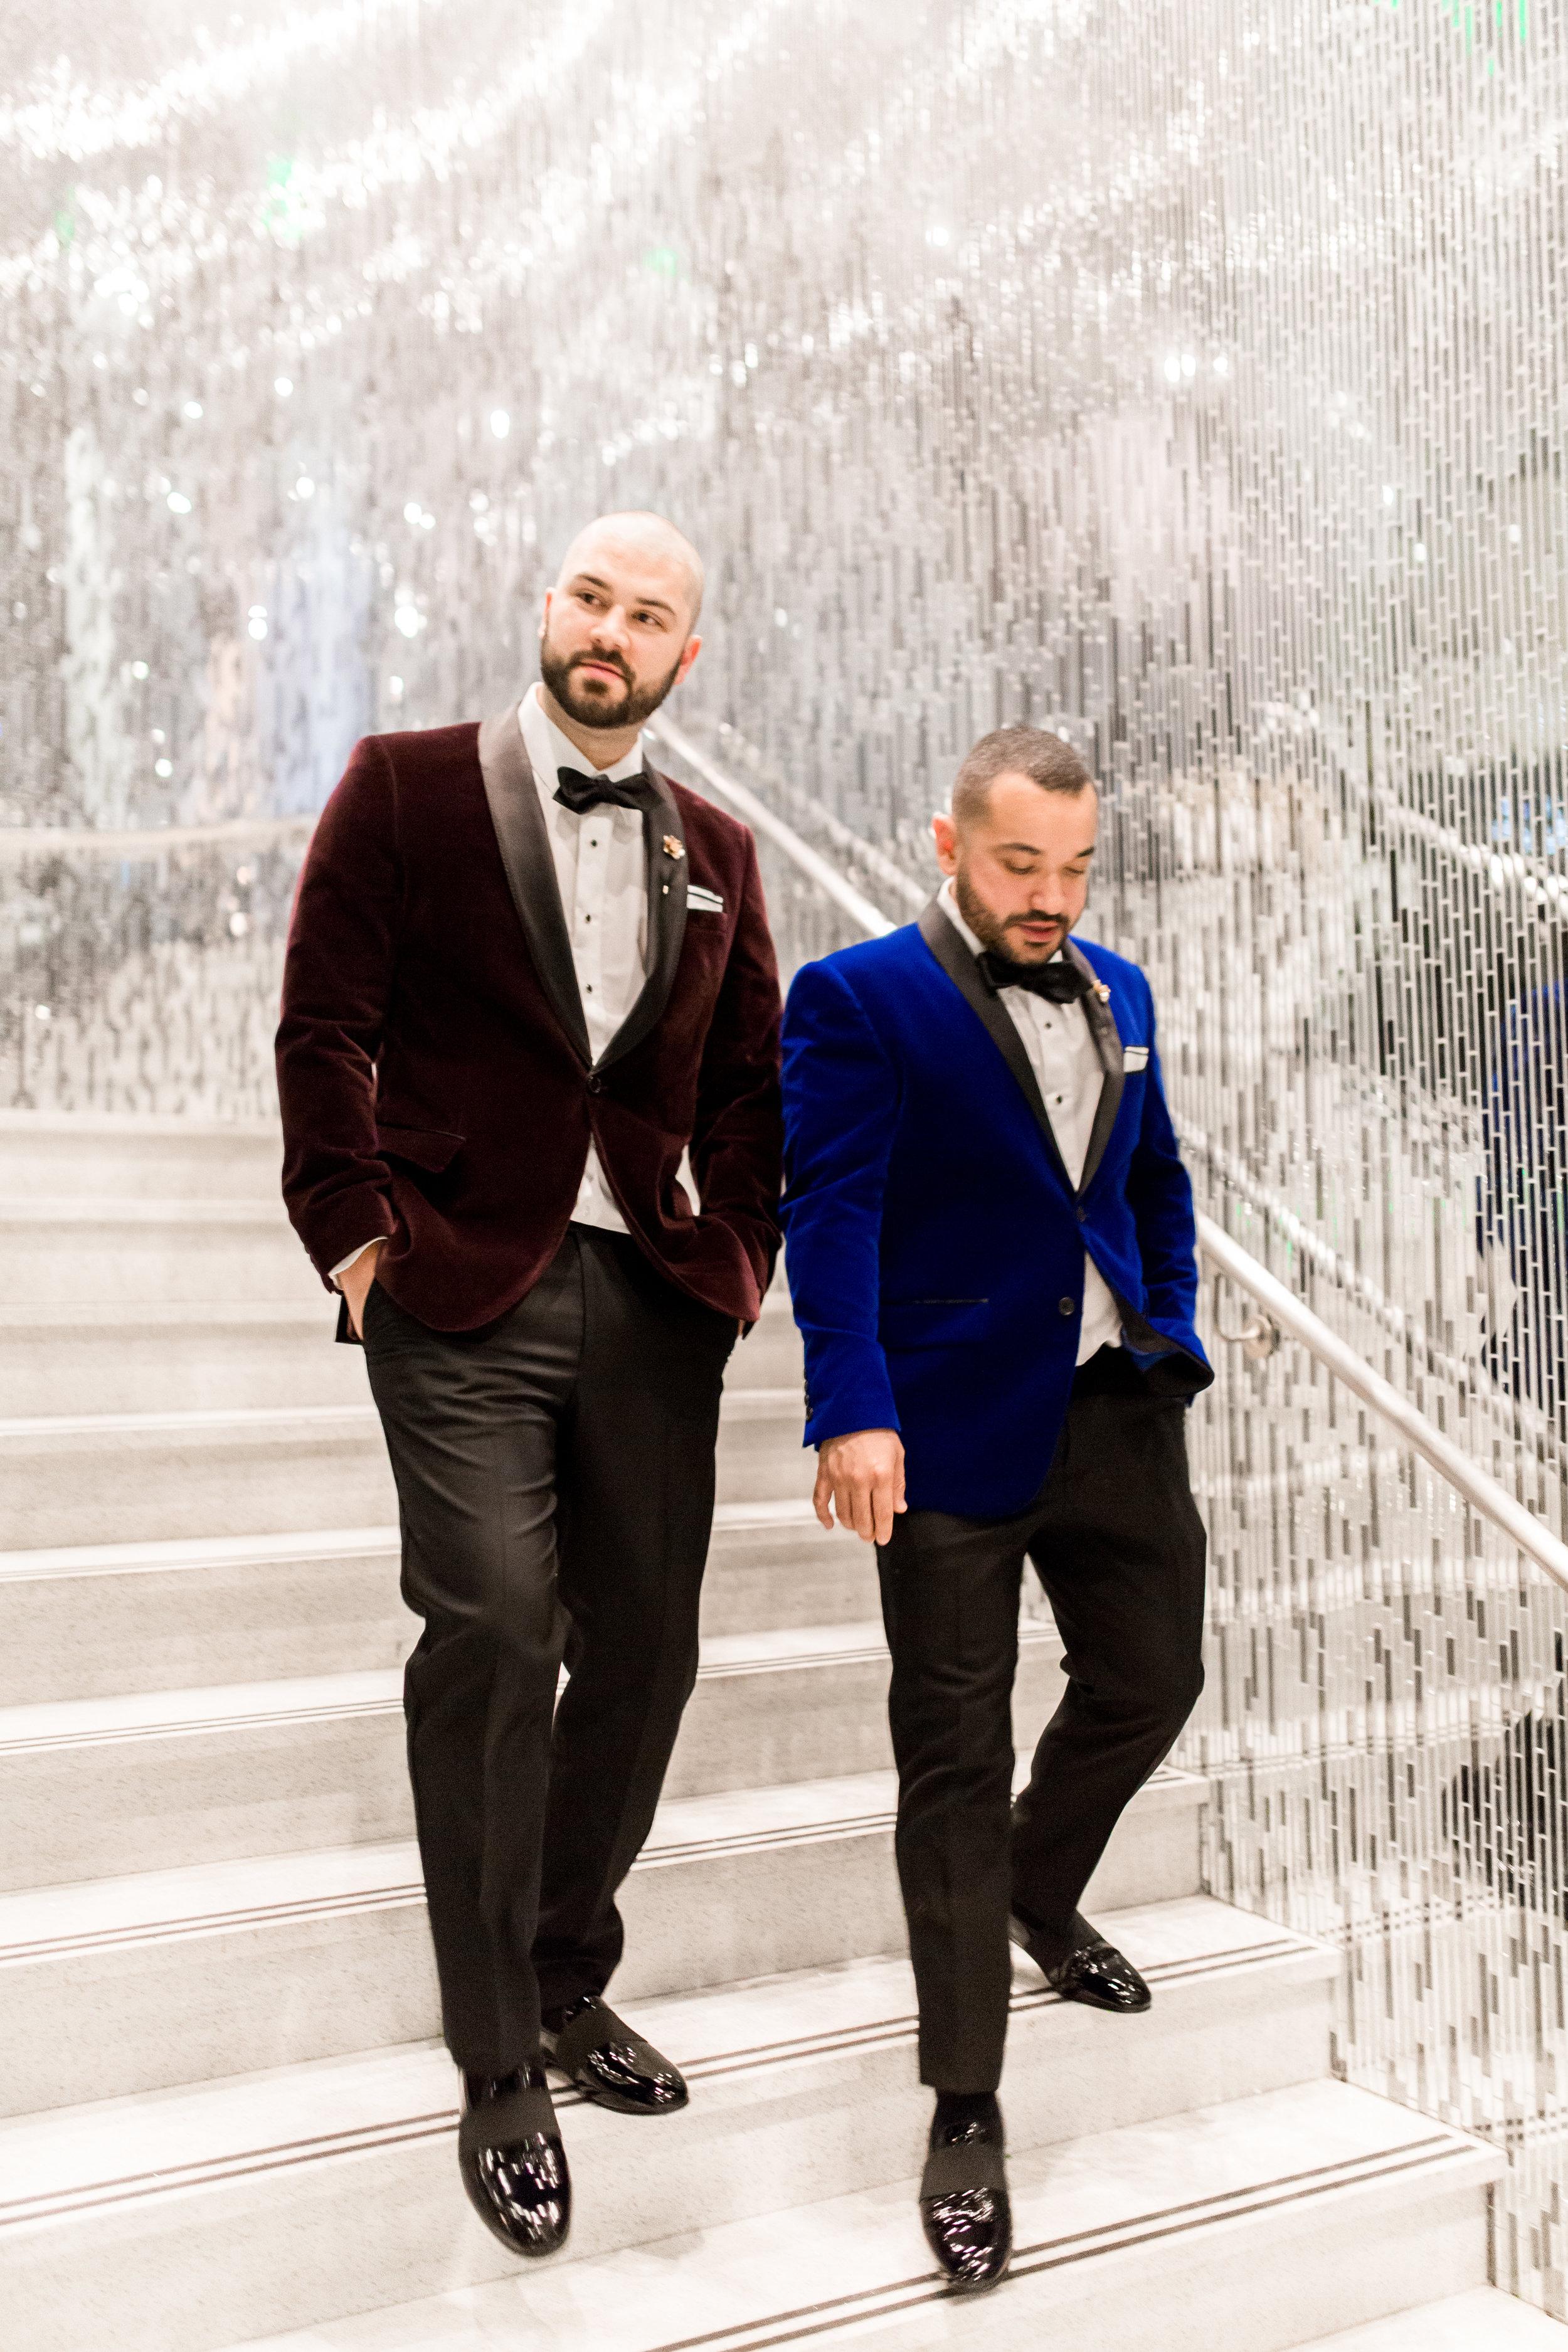 Oscar&Jason_Wedding11.03.17_MichelleKylePhotography-153.jpg